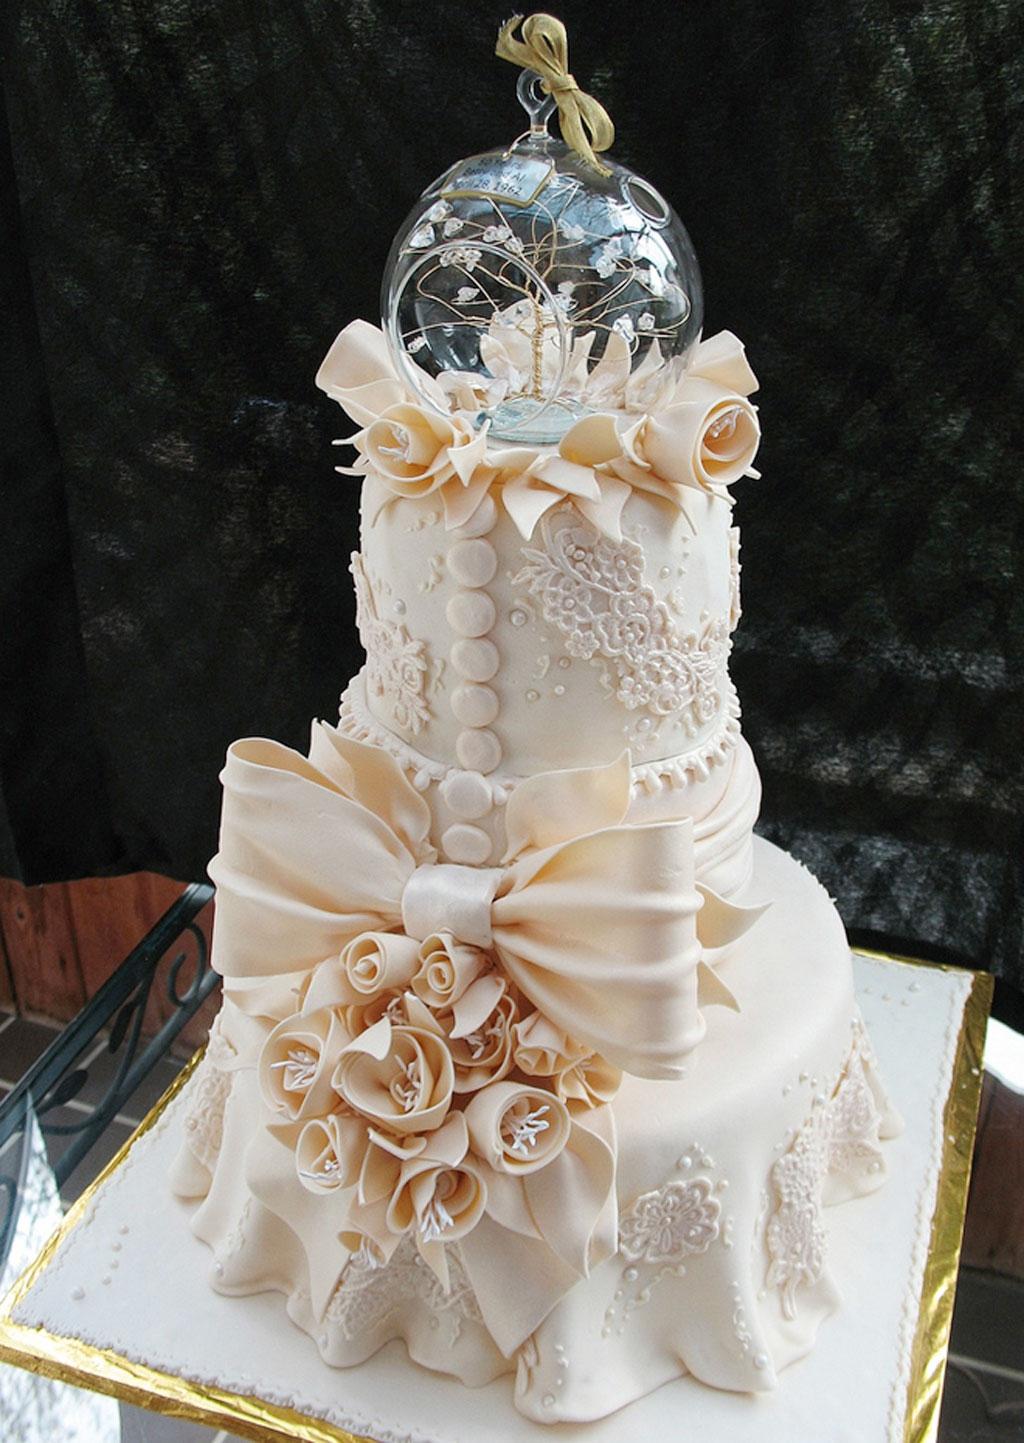 Crazy beautiful wedding cakes wedding cake cake ideas by prayface crazy beautiful wedding cakes picture in wedding cake junglespirit Choice Image